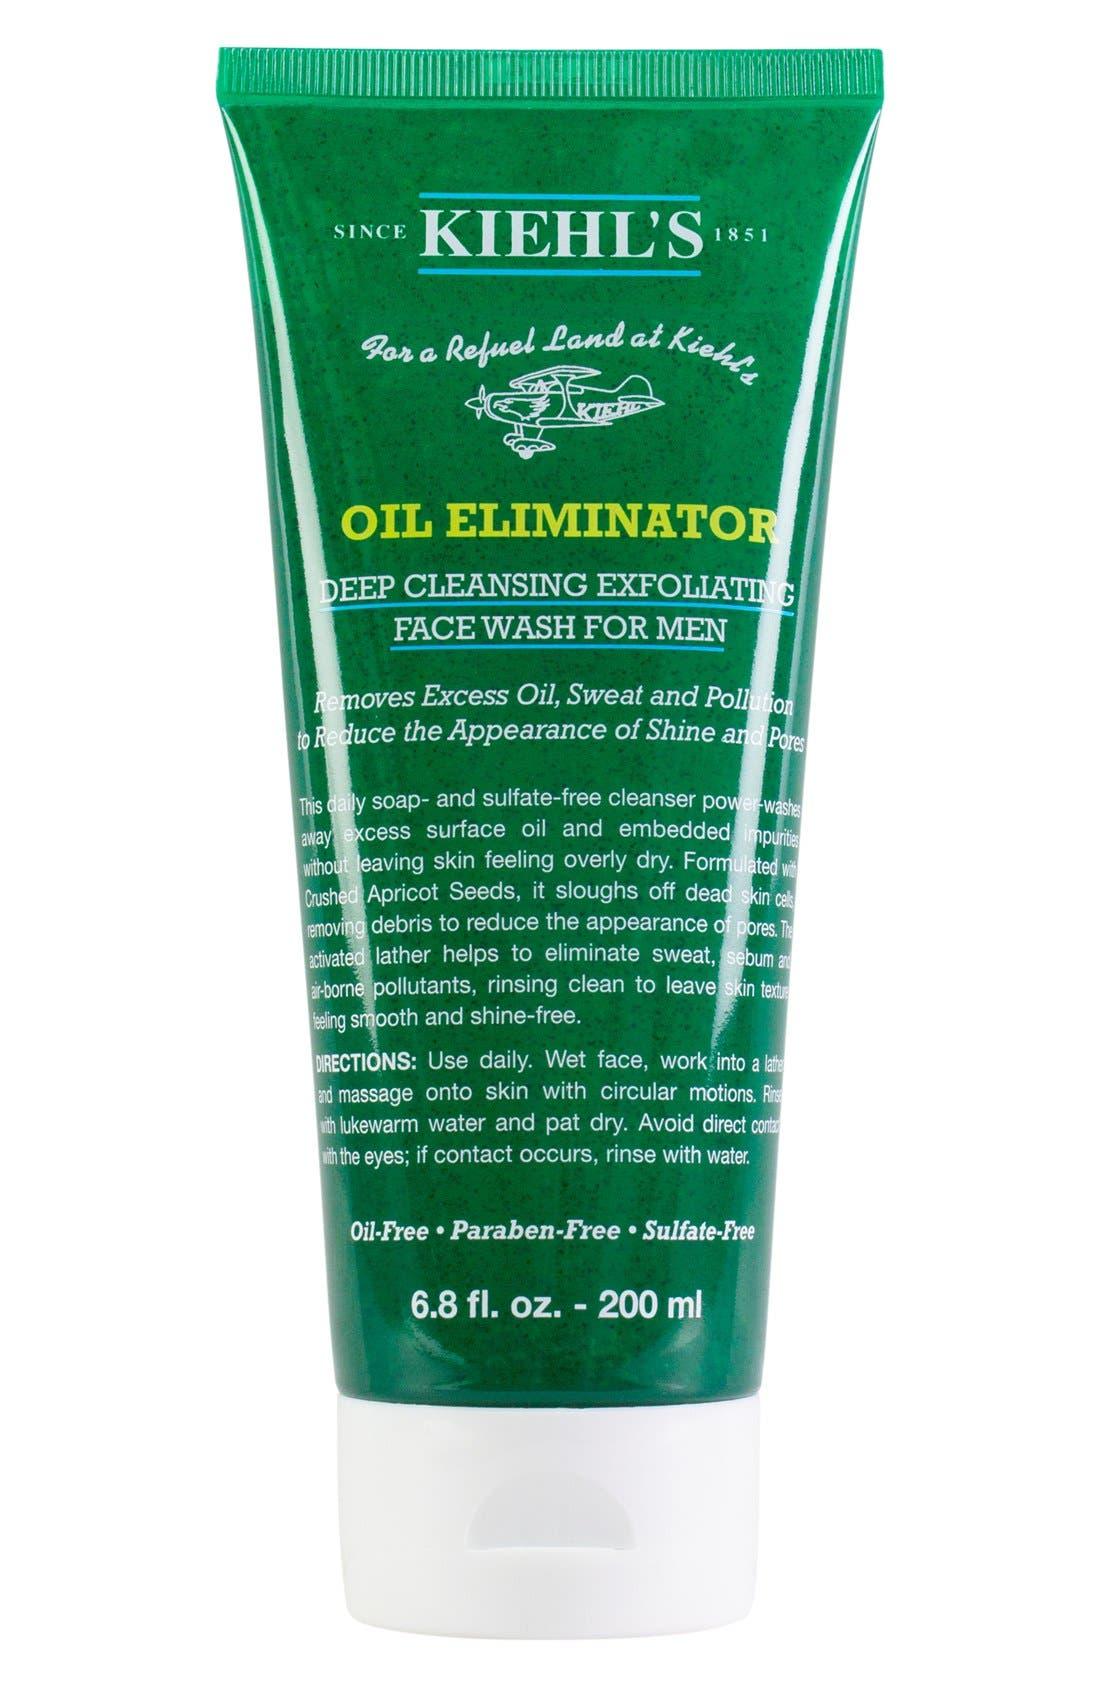 Kiehl's Since 1851 'Oil Eliminator' Deep Cleansing Exfoliating Face Wash for Men